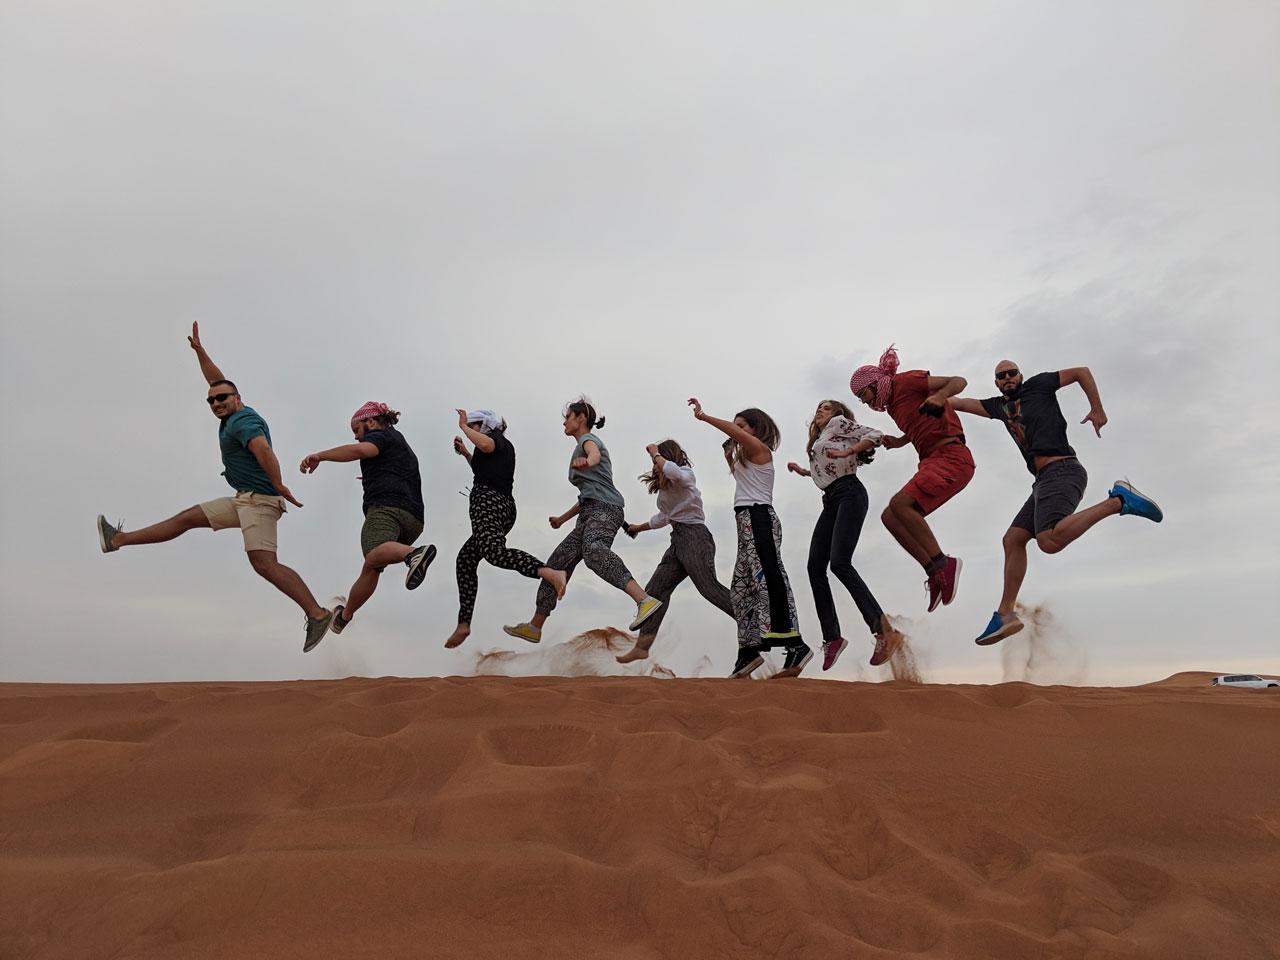 the FishingBooker crew enjoying the desert near Dubai, UAE